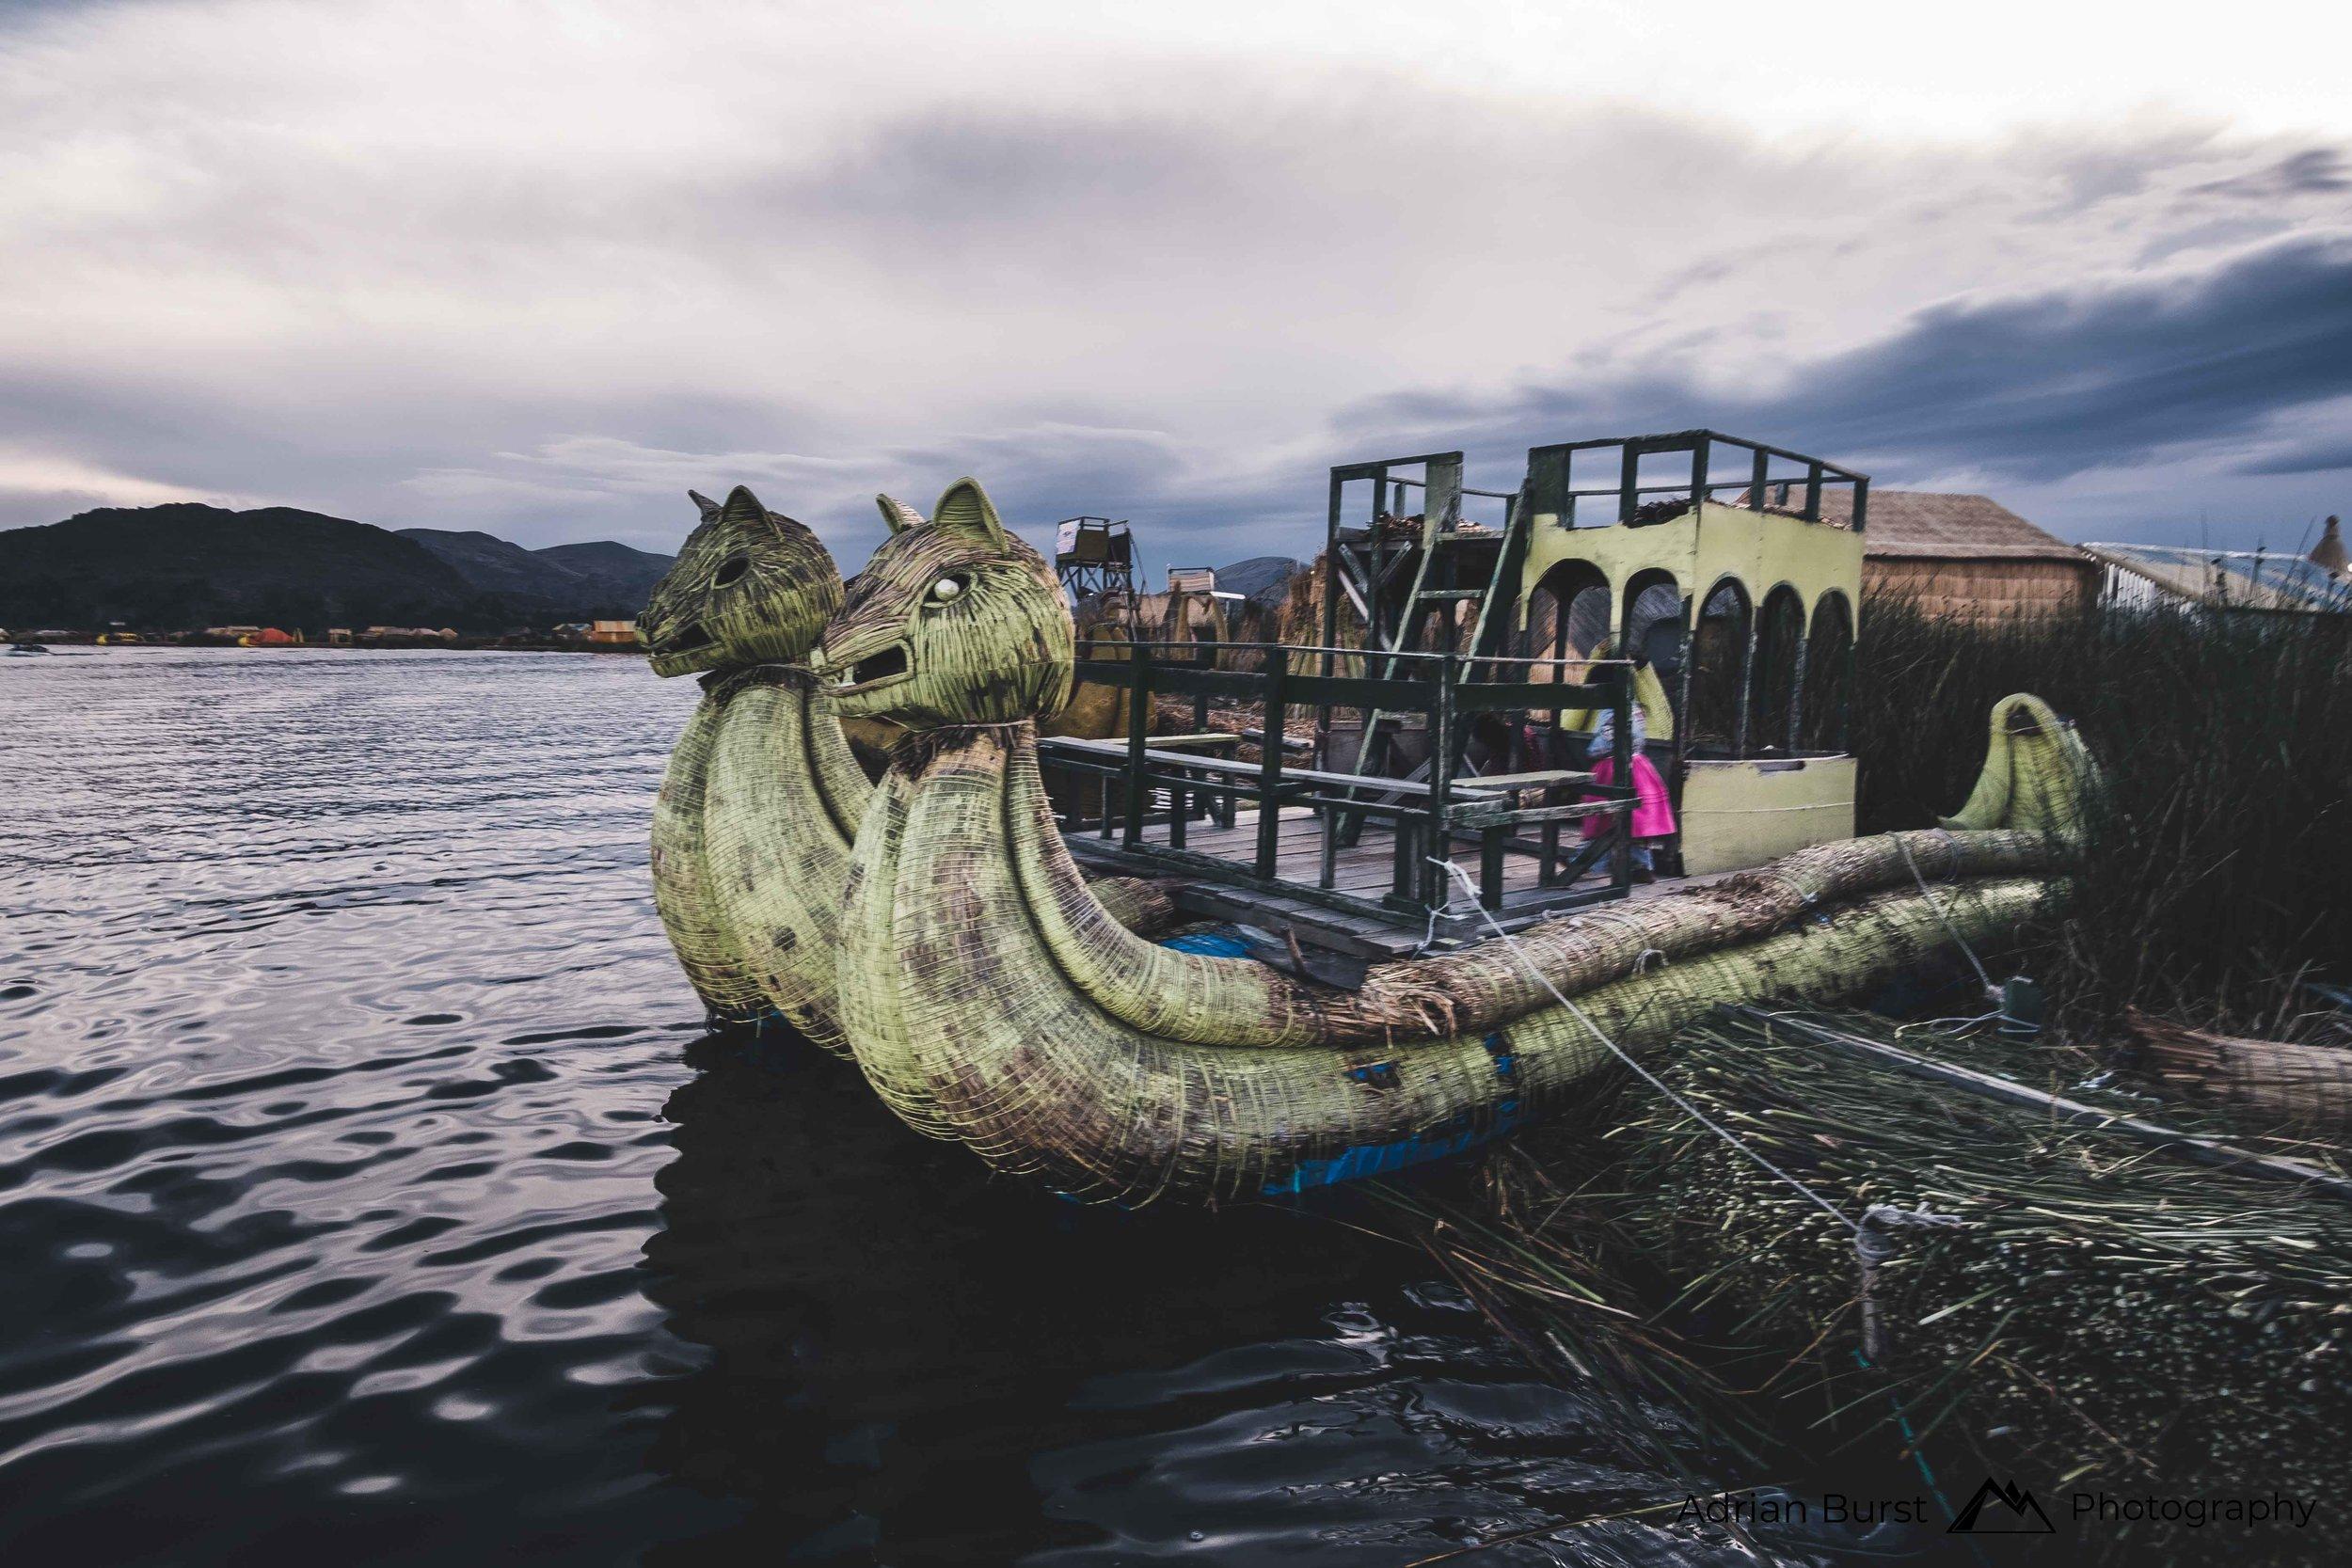 139 | Floating islands, Titicaca lake, Puno